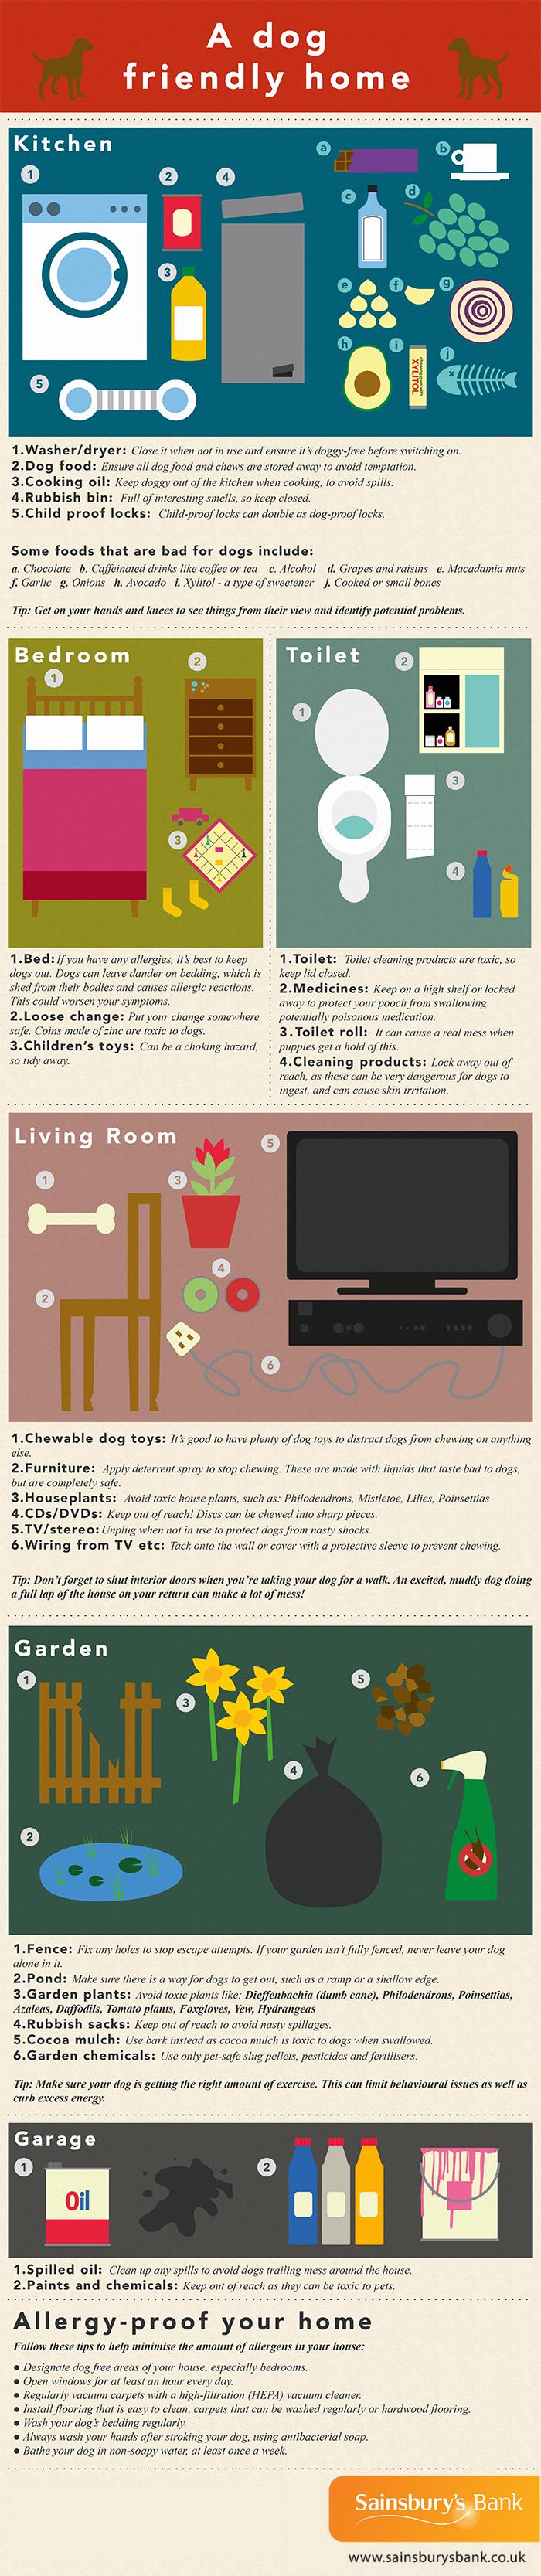 a-dog-friendly-home